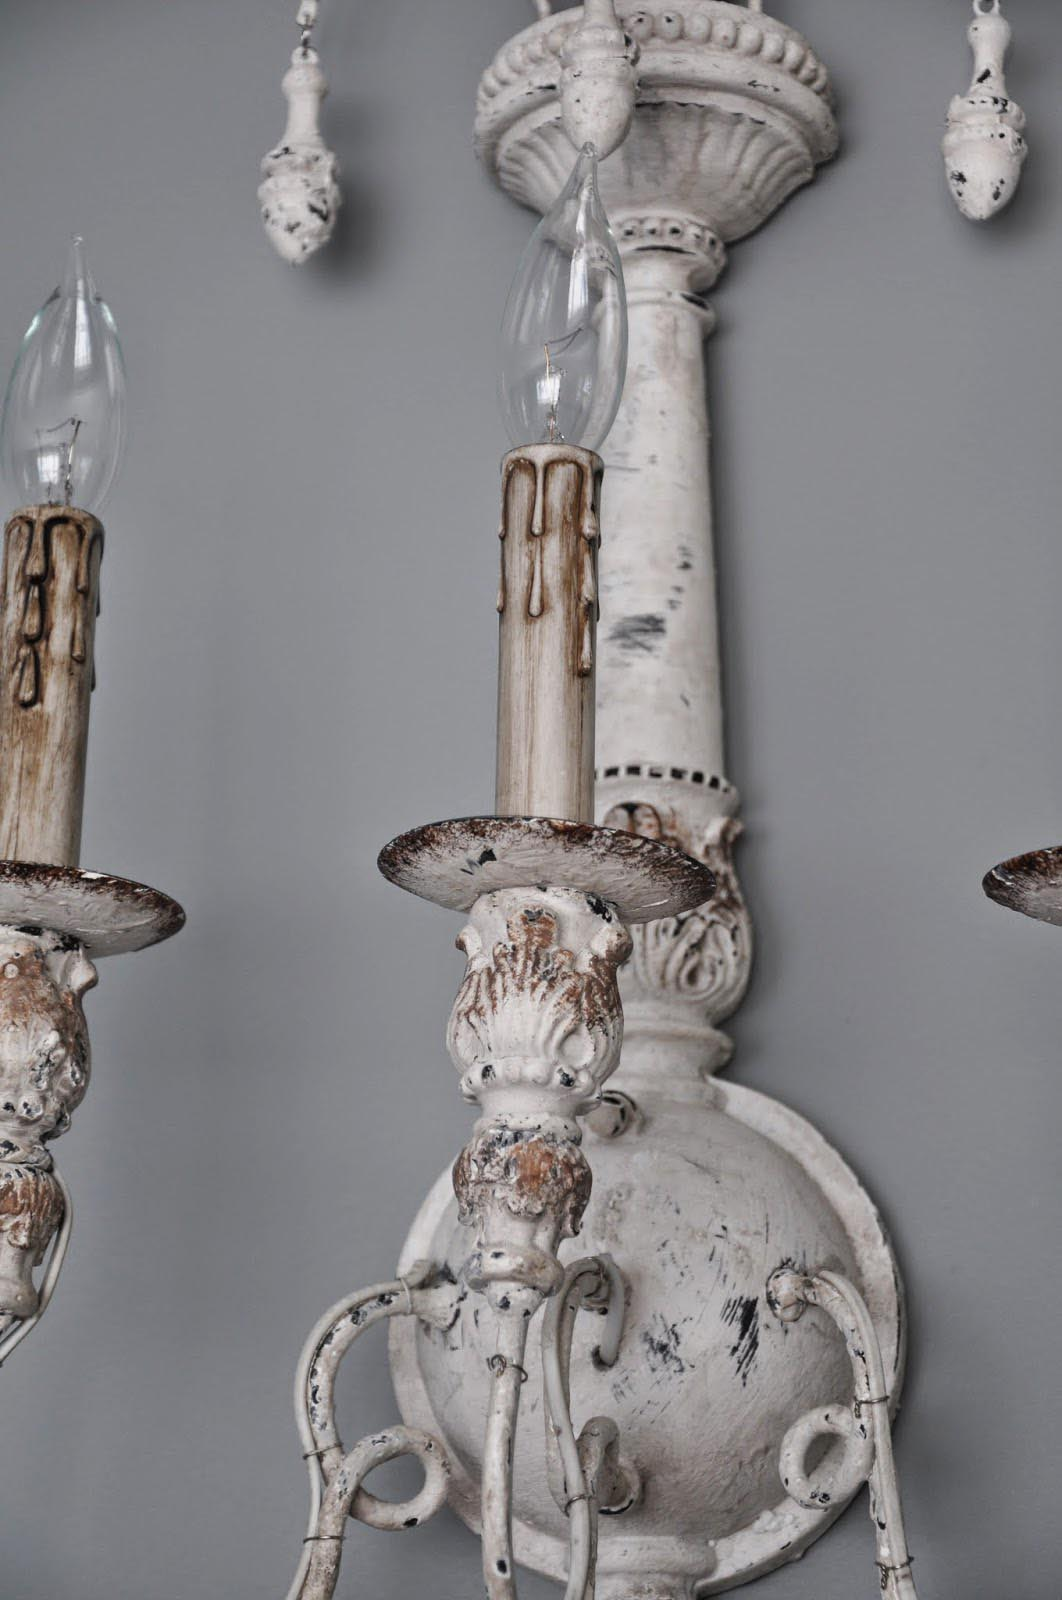 french country lighting fixtures kitchen utensils strainer farmhouse light